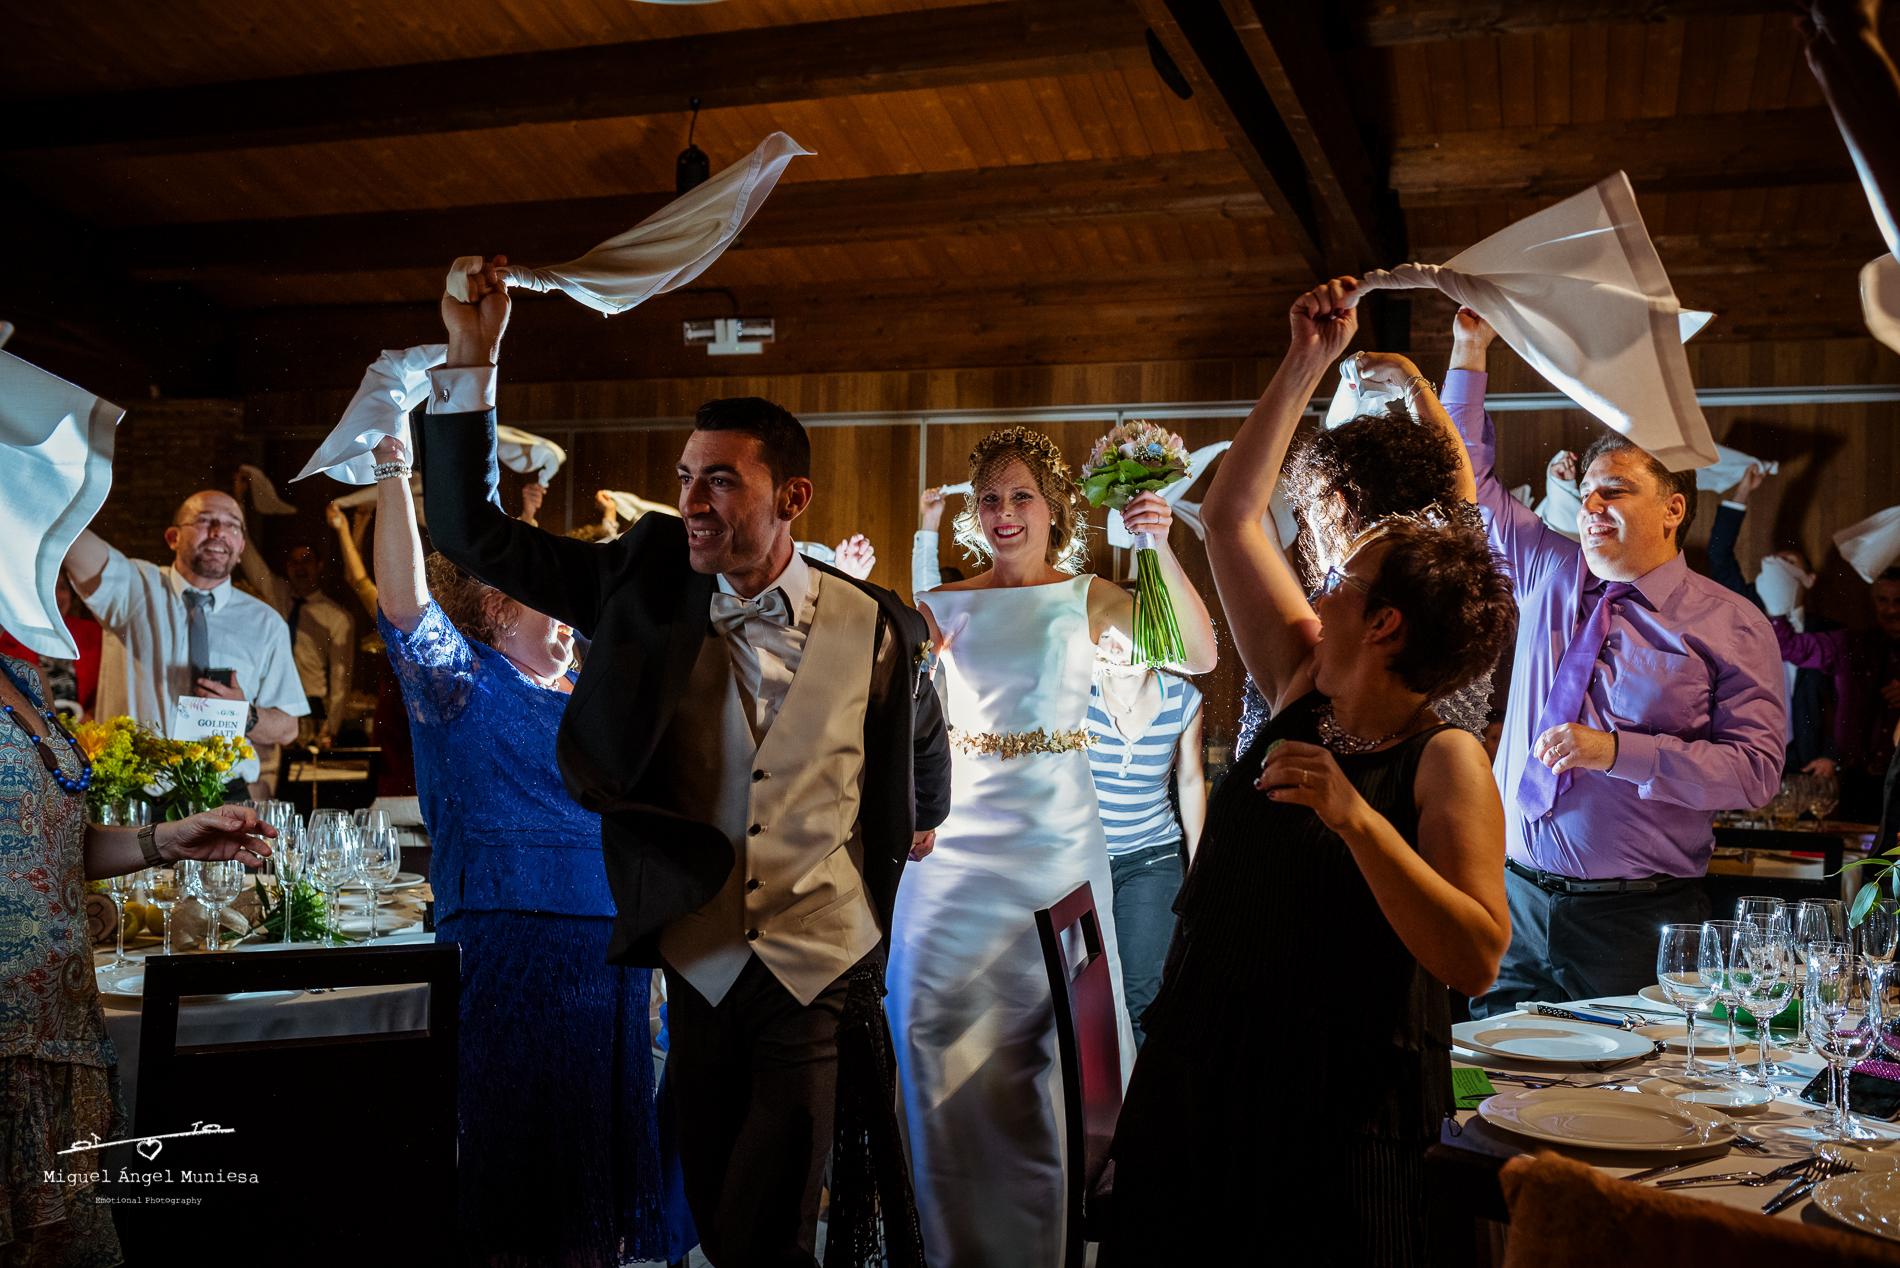 boda, fotografia de boda, boda zaragoza, fotografia, wedding, wedding photography, miguel angel muniesa, fotografo boda Zaragoza, fotografo boda, destination wedding_ 038